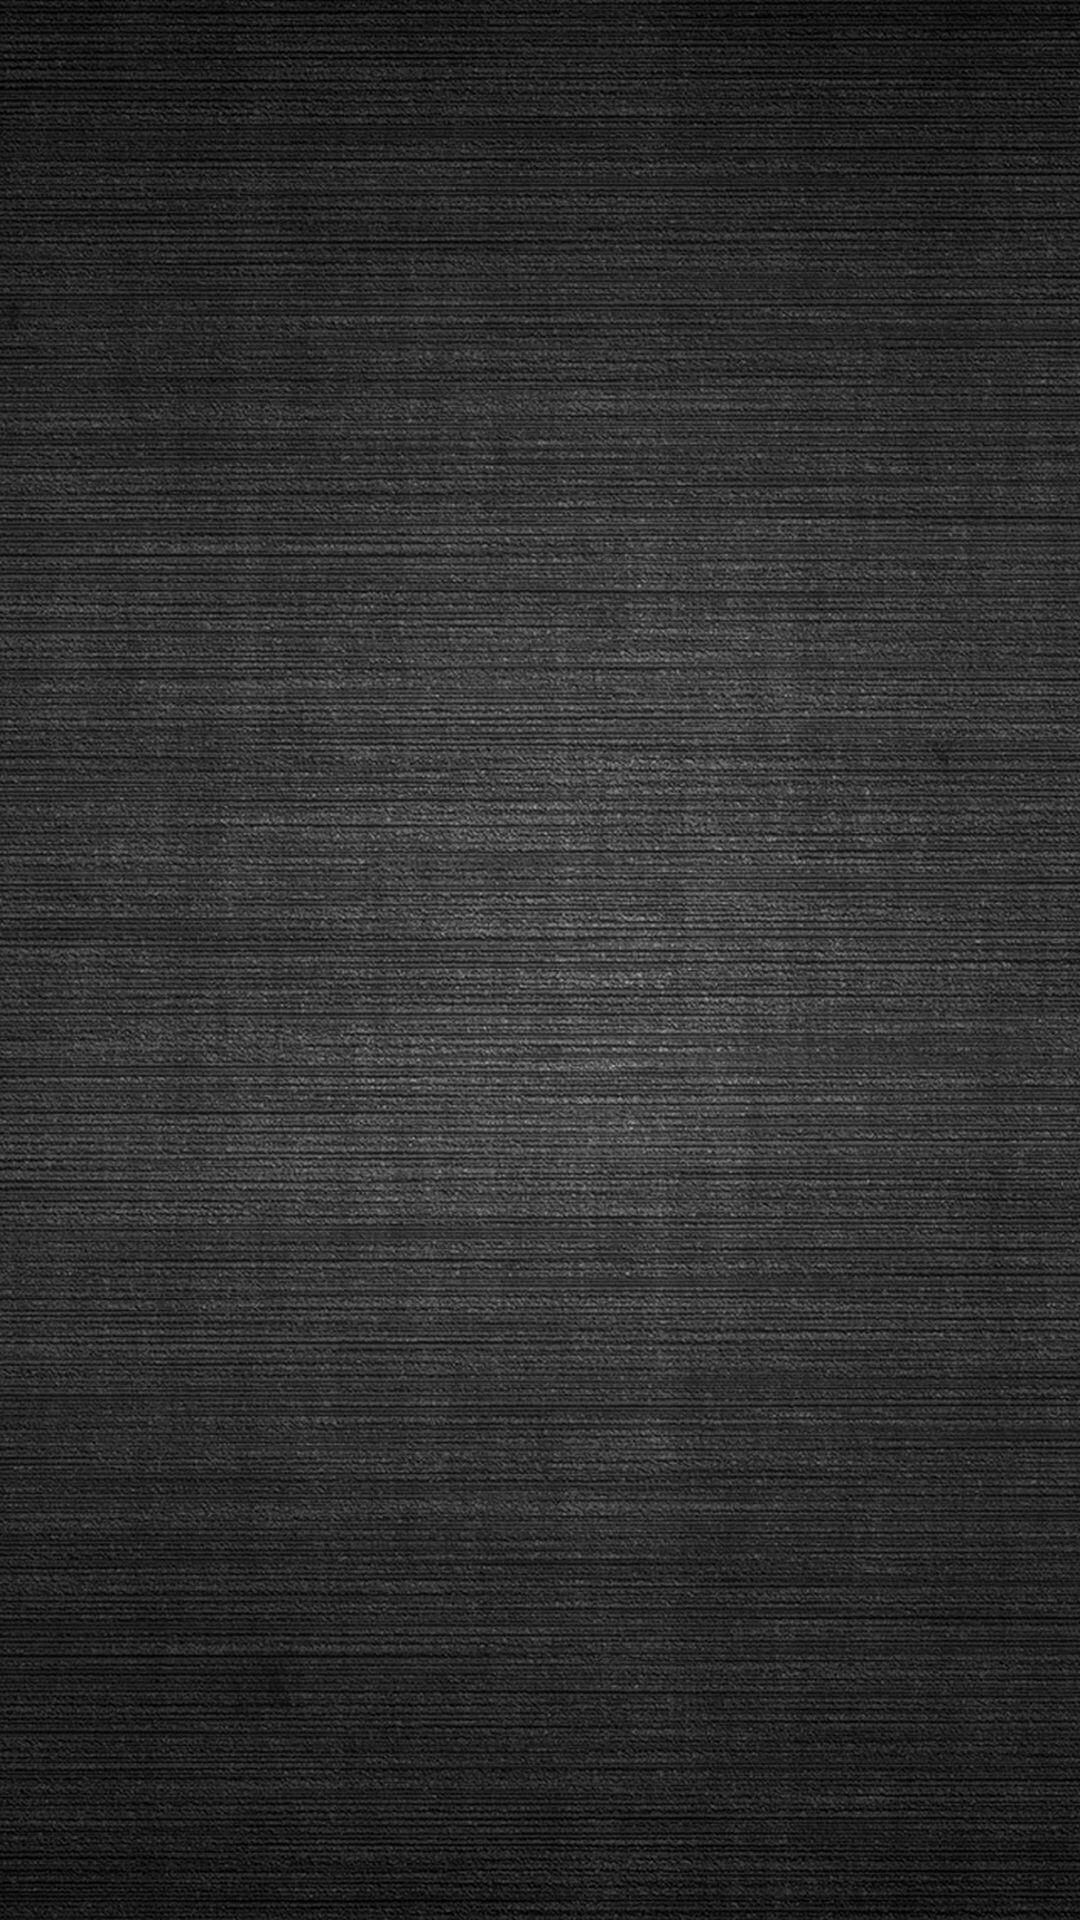 Gray lock screen wallpaper